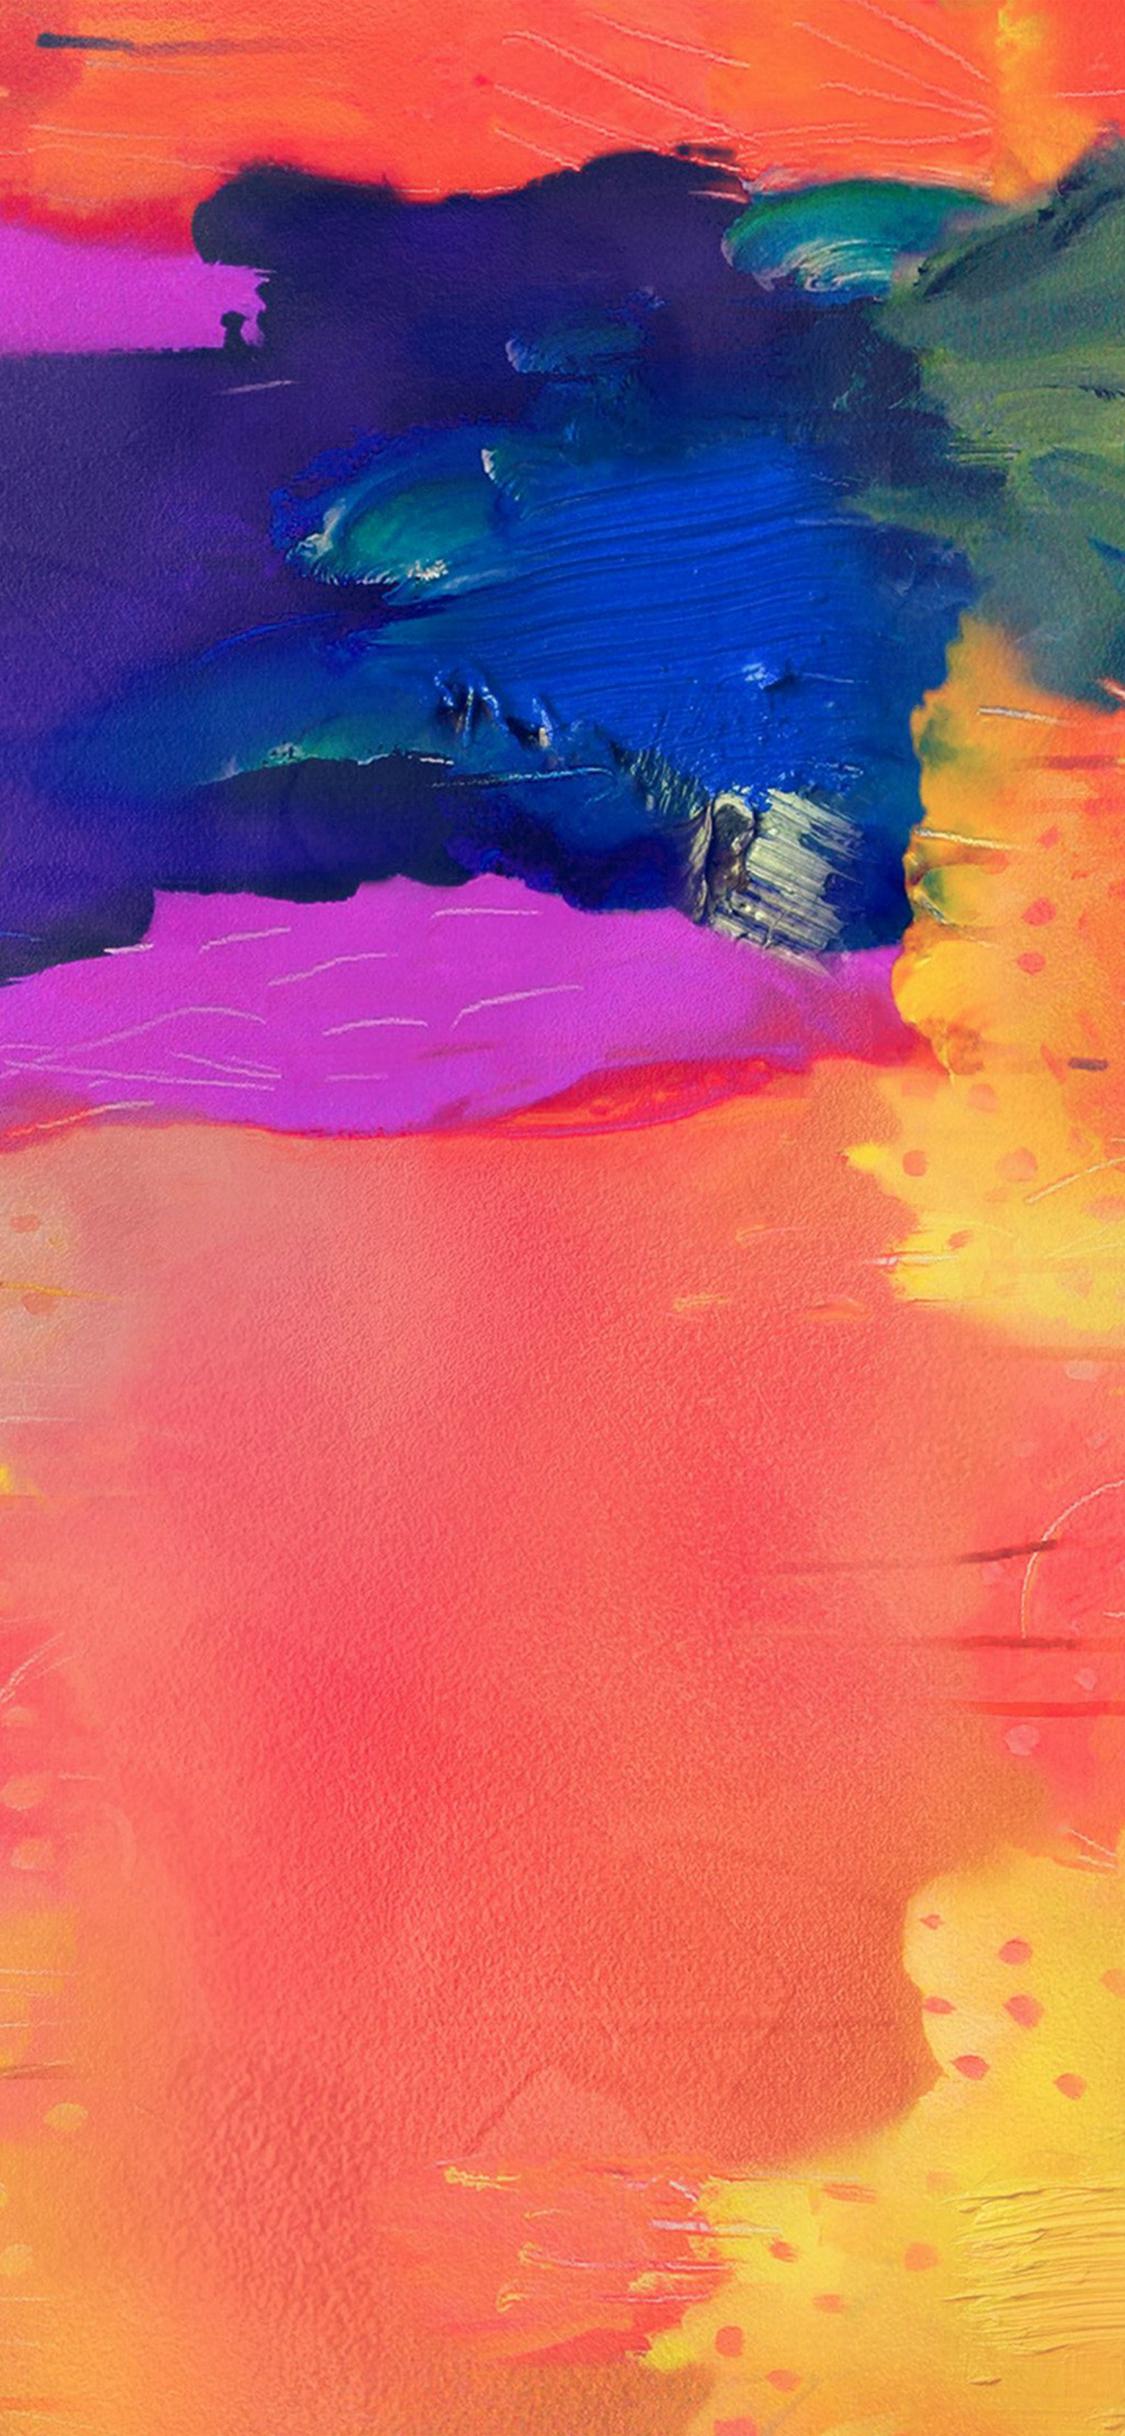 Rainbow Galaxy Wallpaper Posted By Ryan Walker